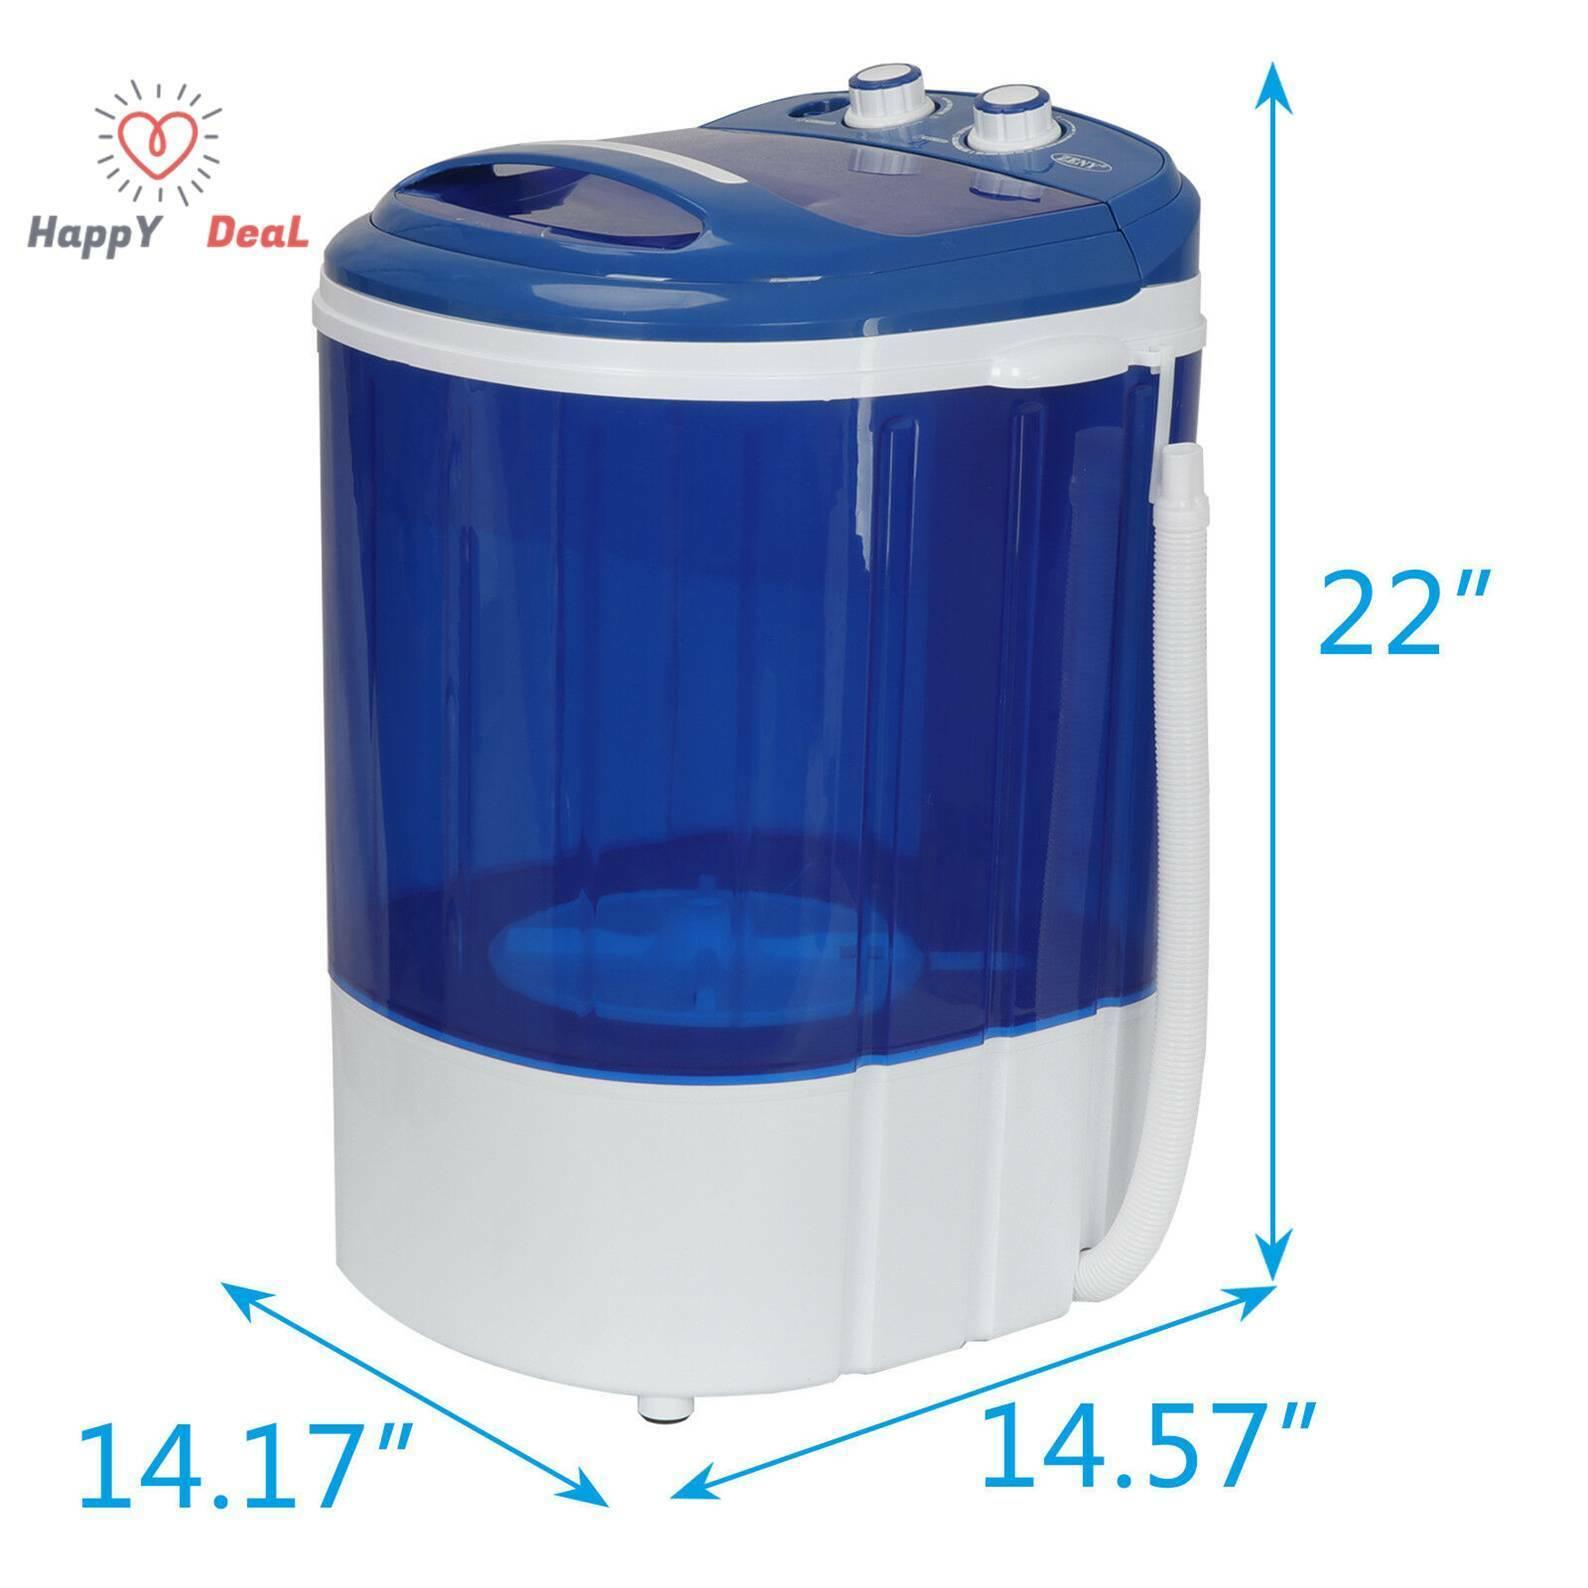 9 Lbs Portable Mini Washing Machine Compact Washer Spin